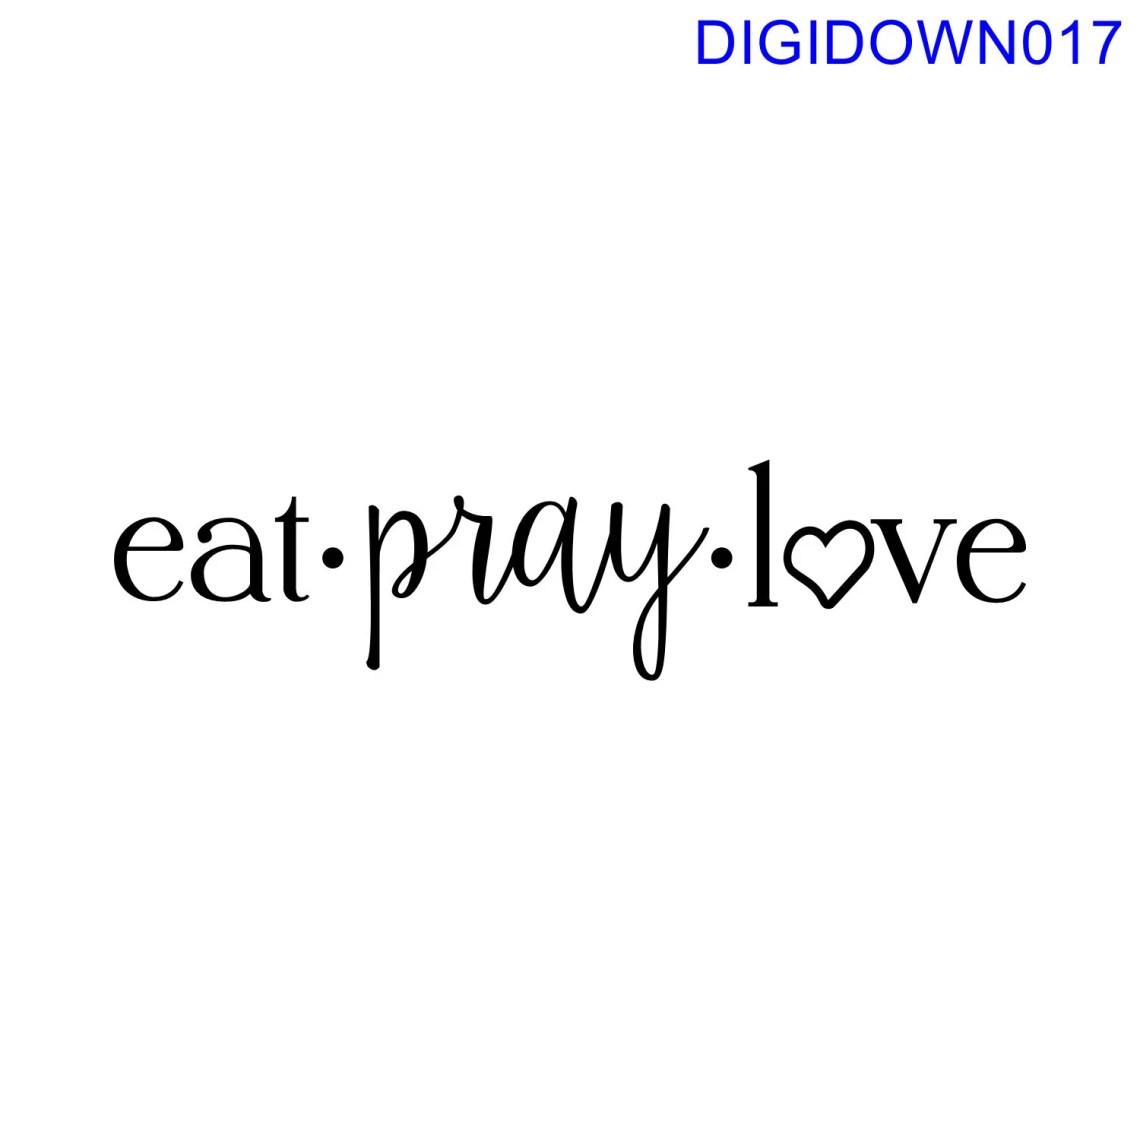 Download eat pray love SVG Cut File mtc svg pdf eps ai dxf